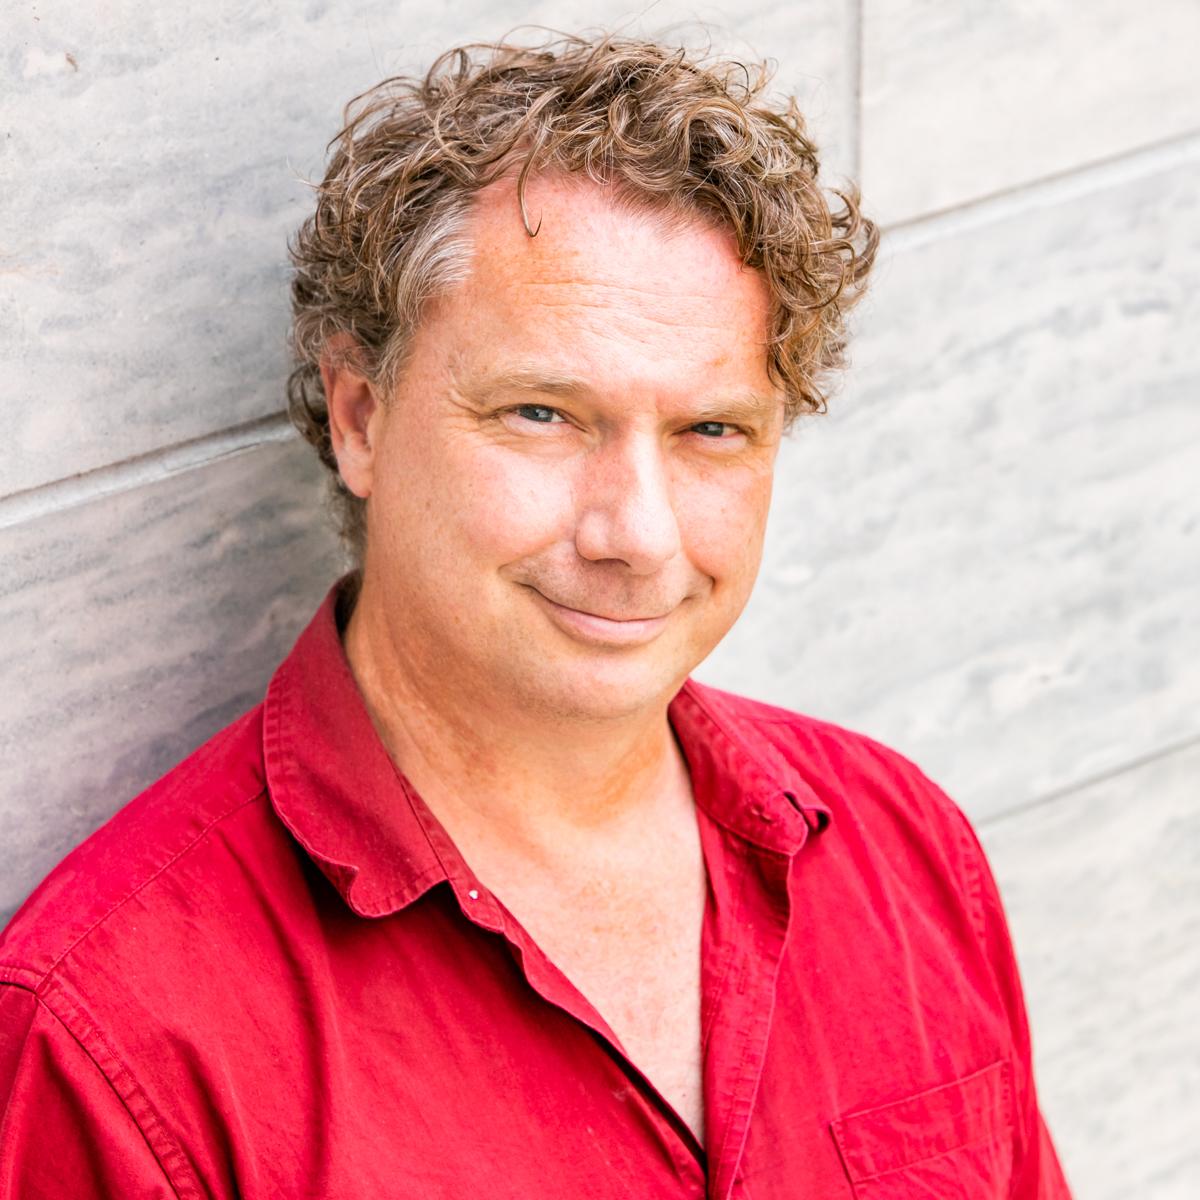 University of Guelph Biotechnology Professor Andrew Hamilton-Wright